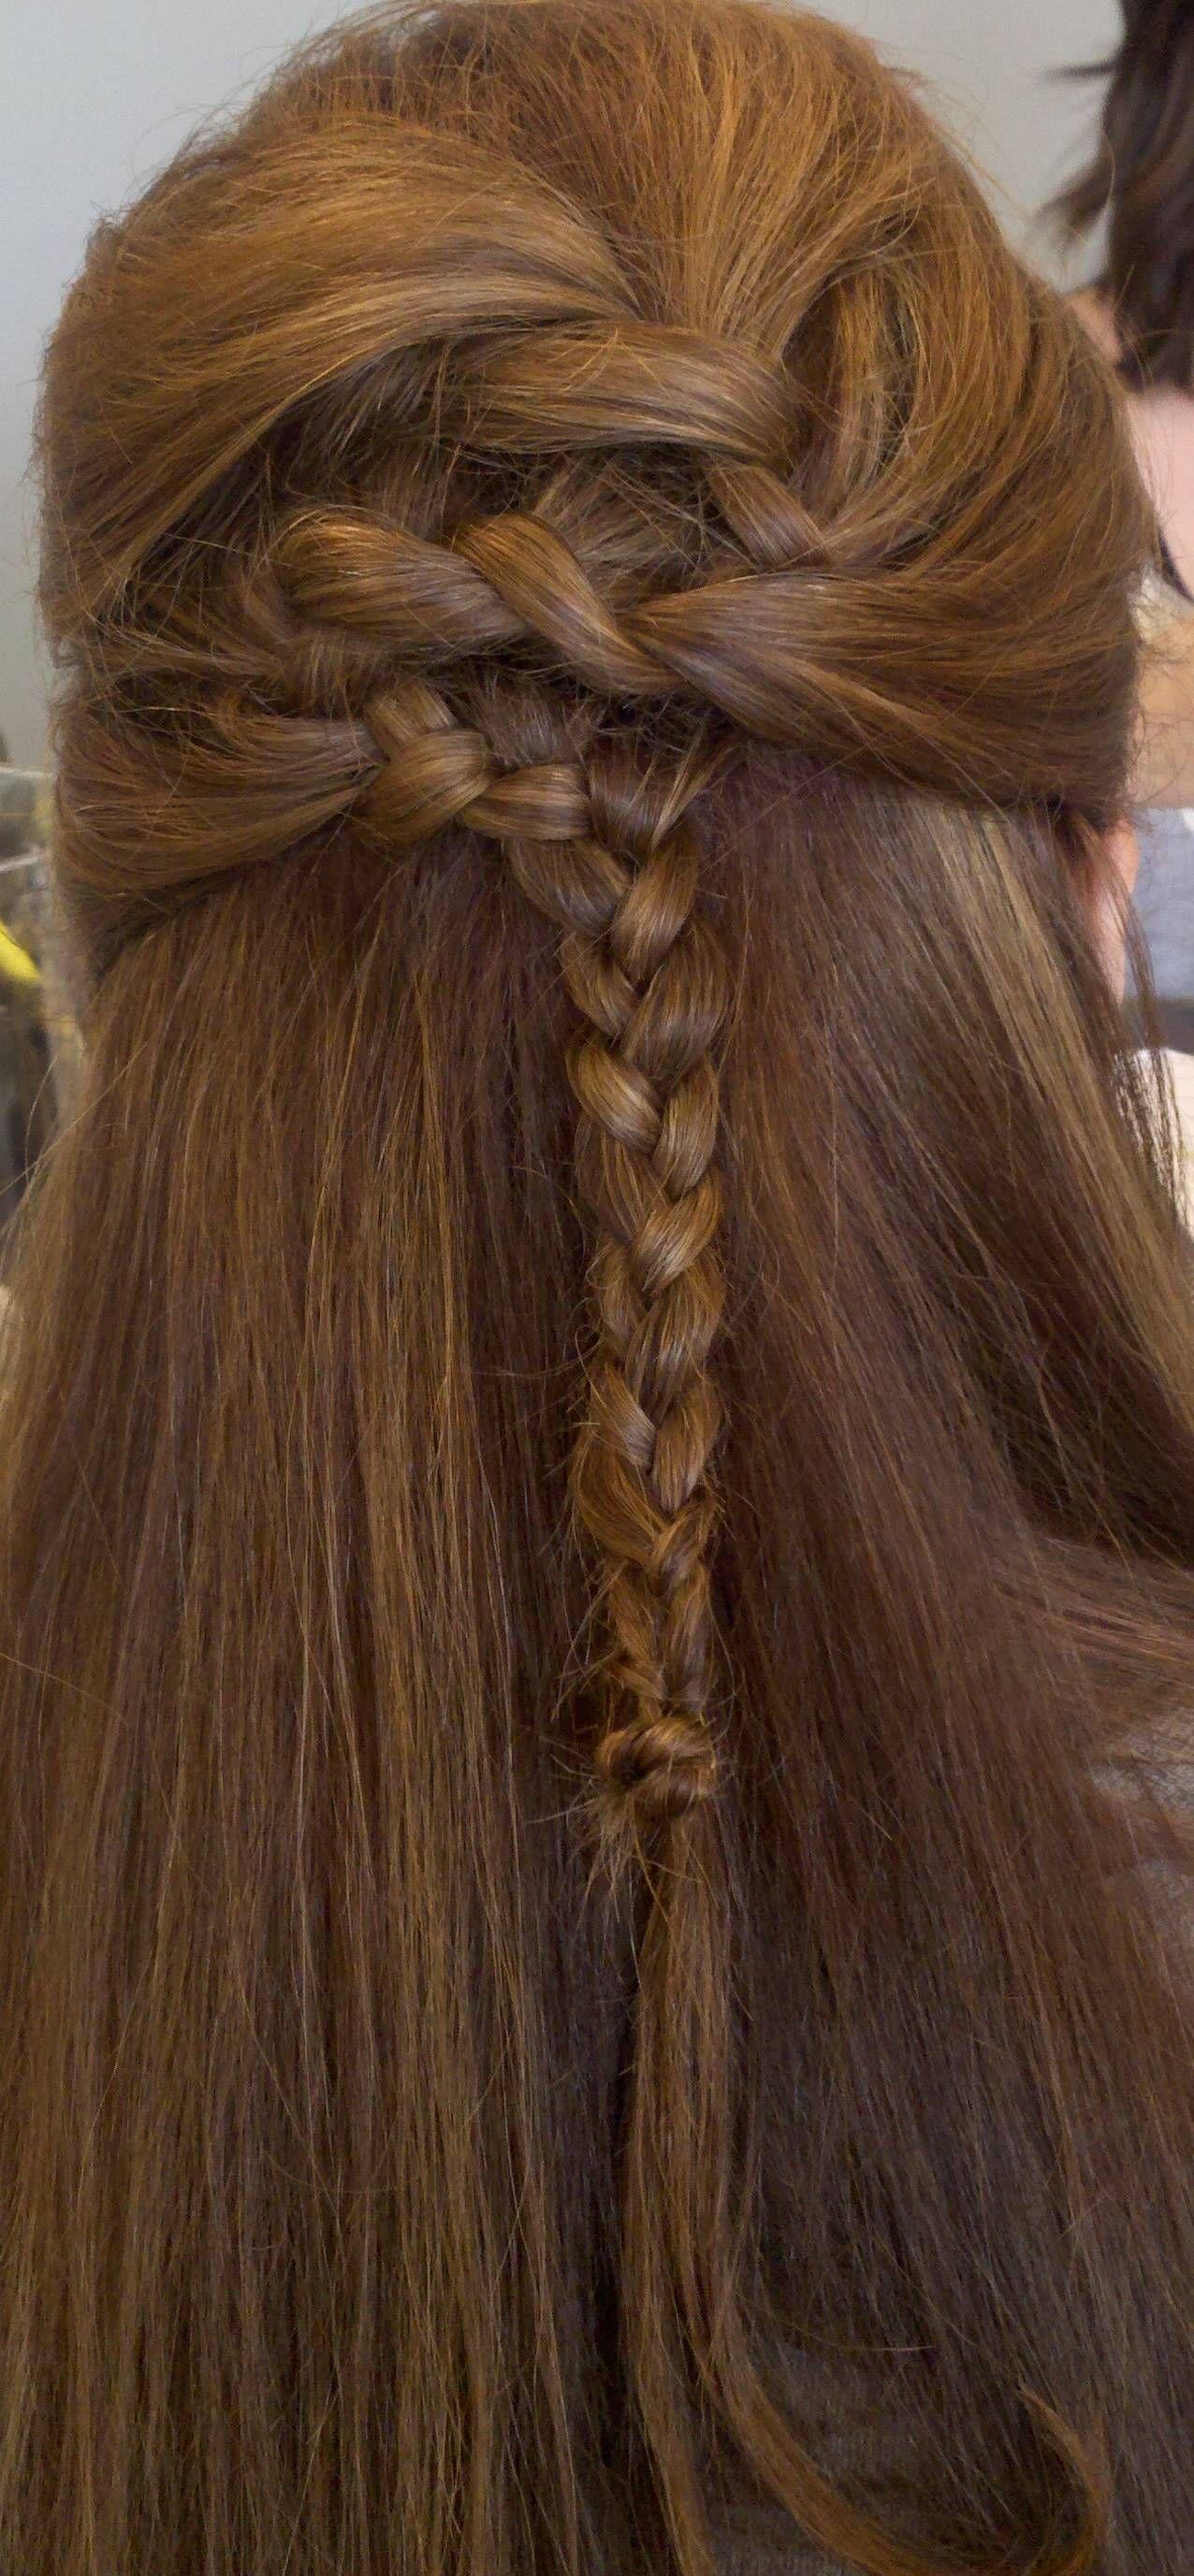 Celtic Huntress Braided Hair.